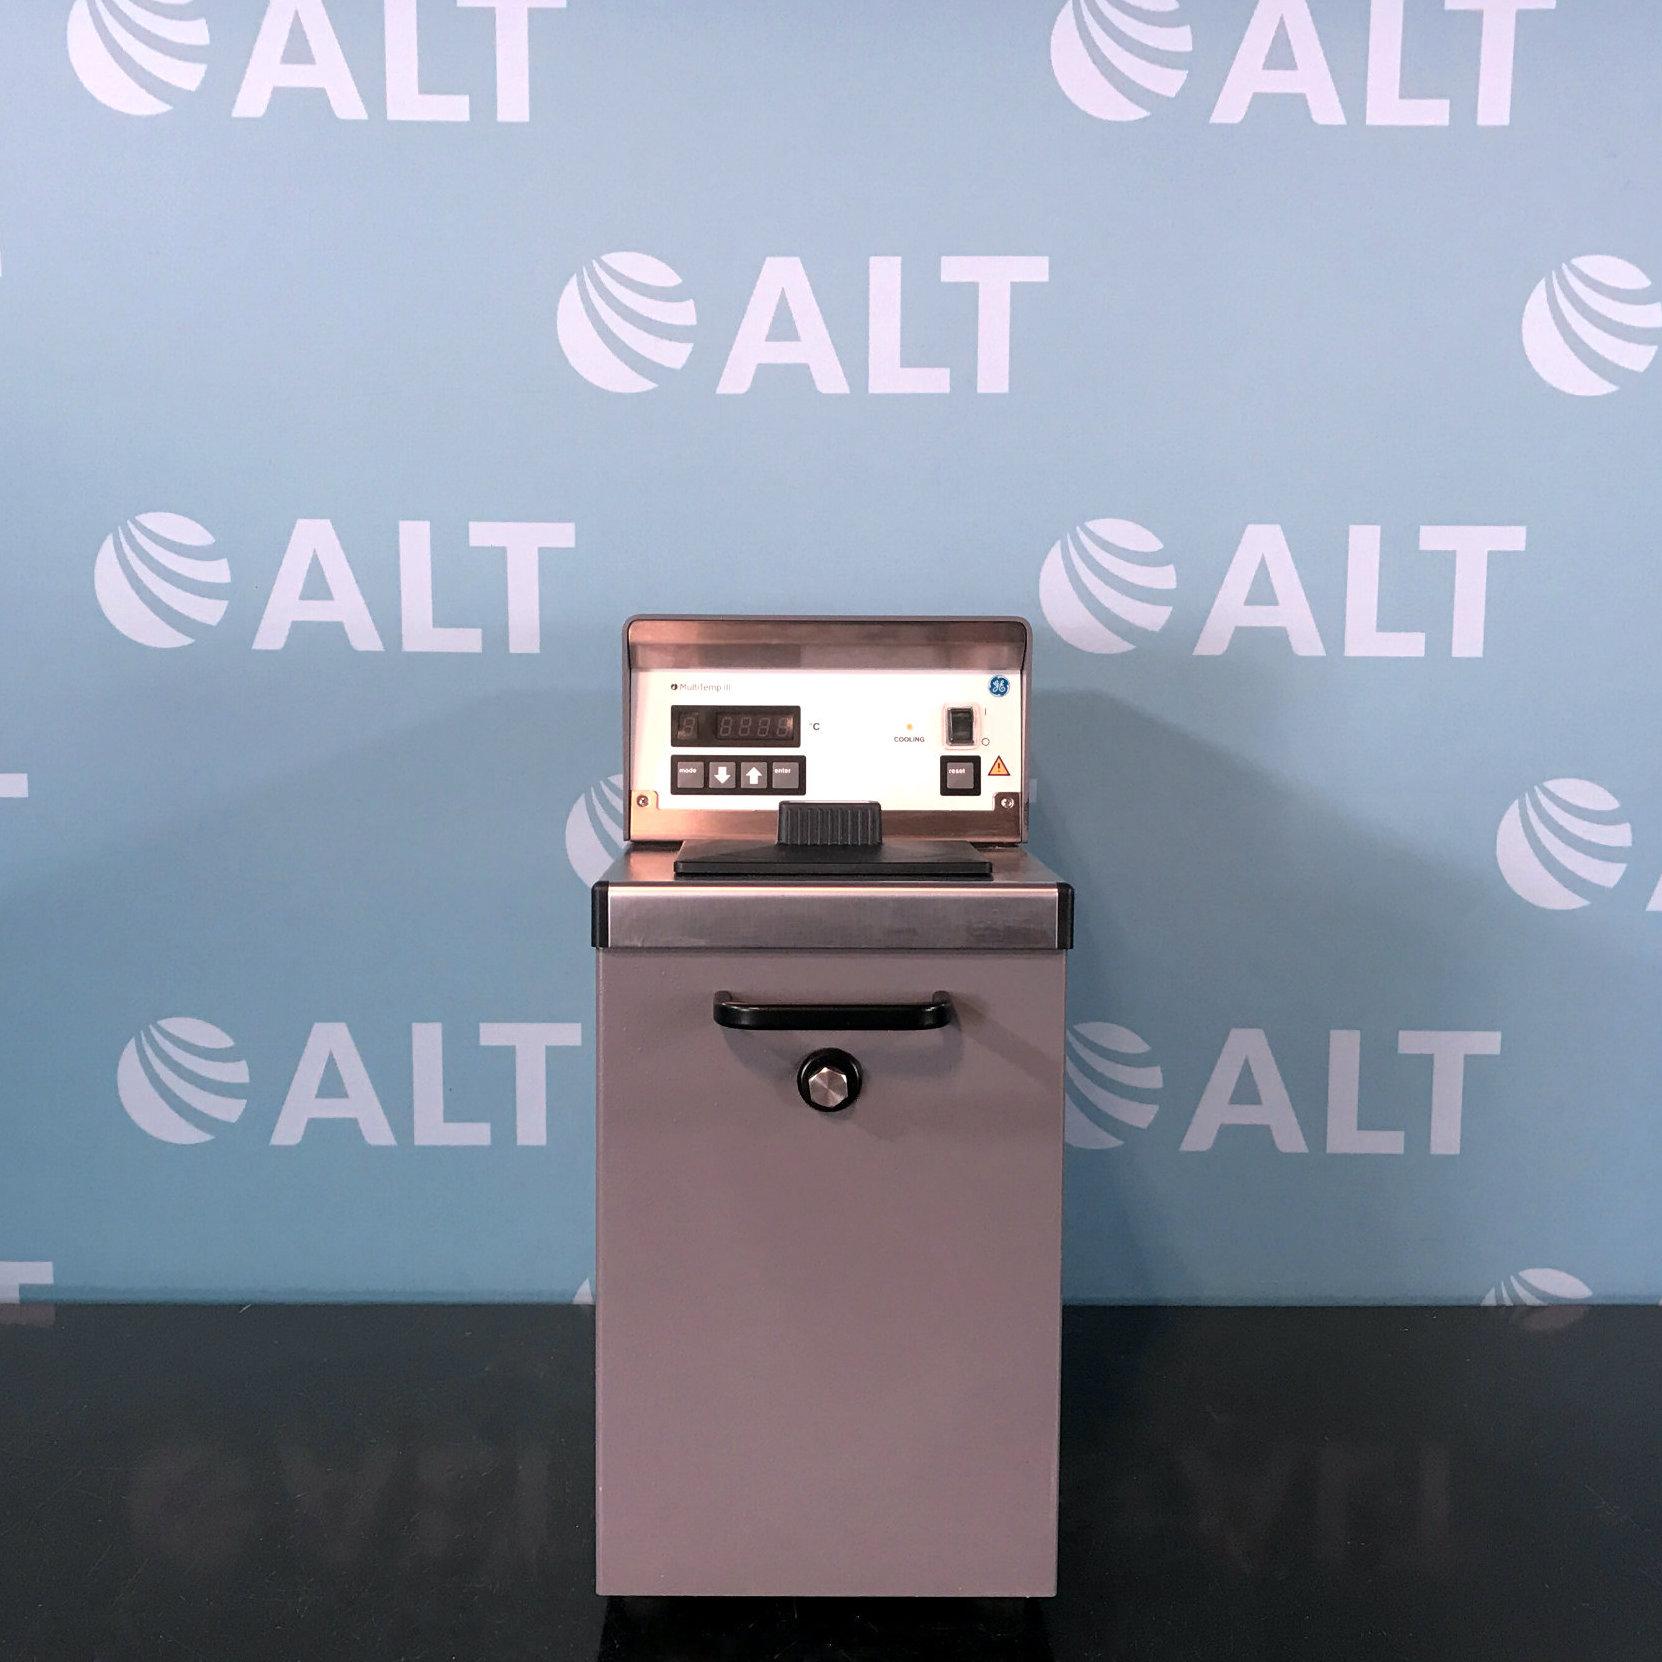 GE Healthcare Life Sciences MultiTemp III Refrigerating Circulator Chiller 18-1102-77 Image